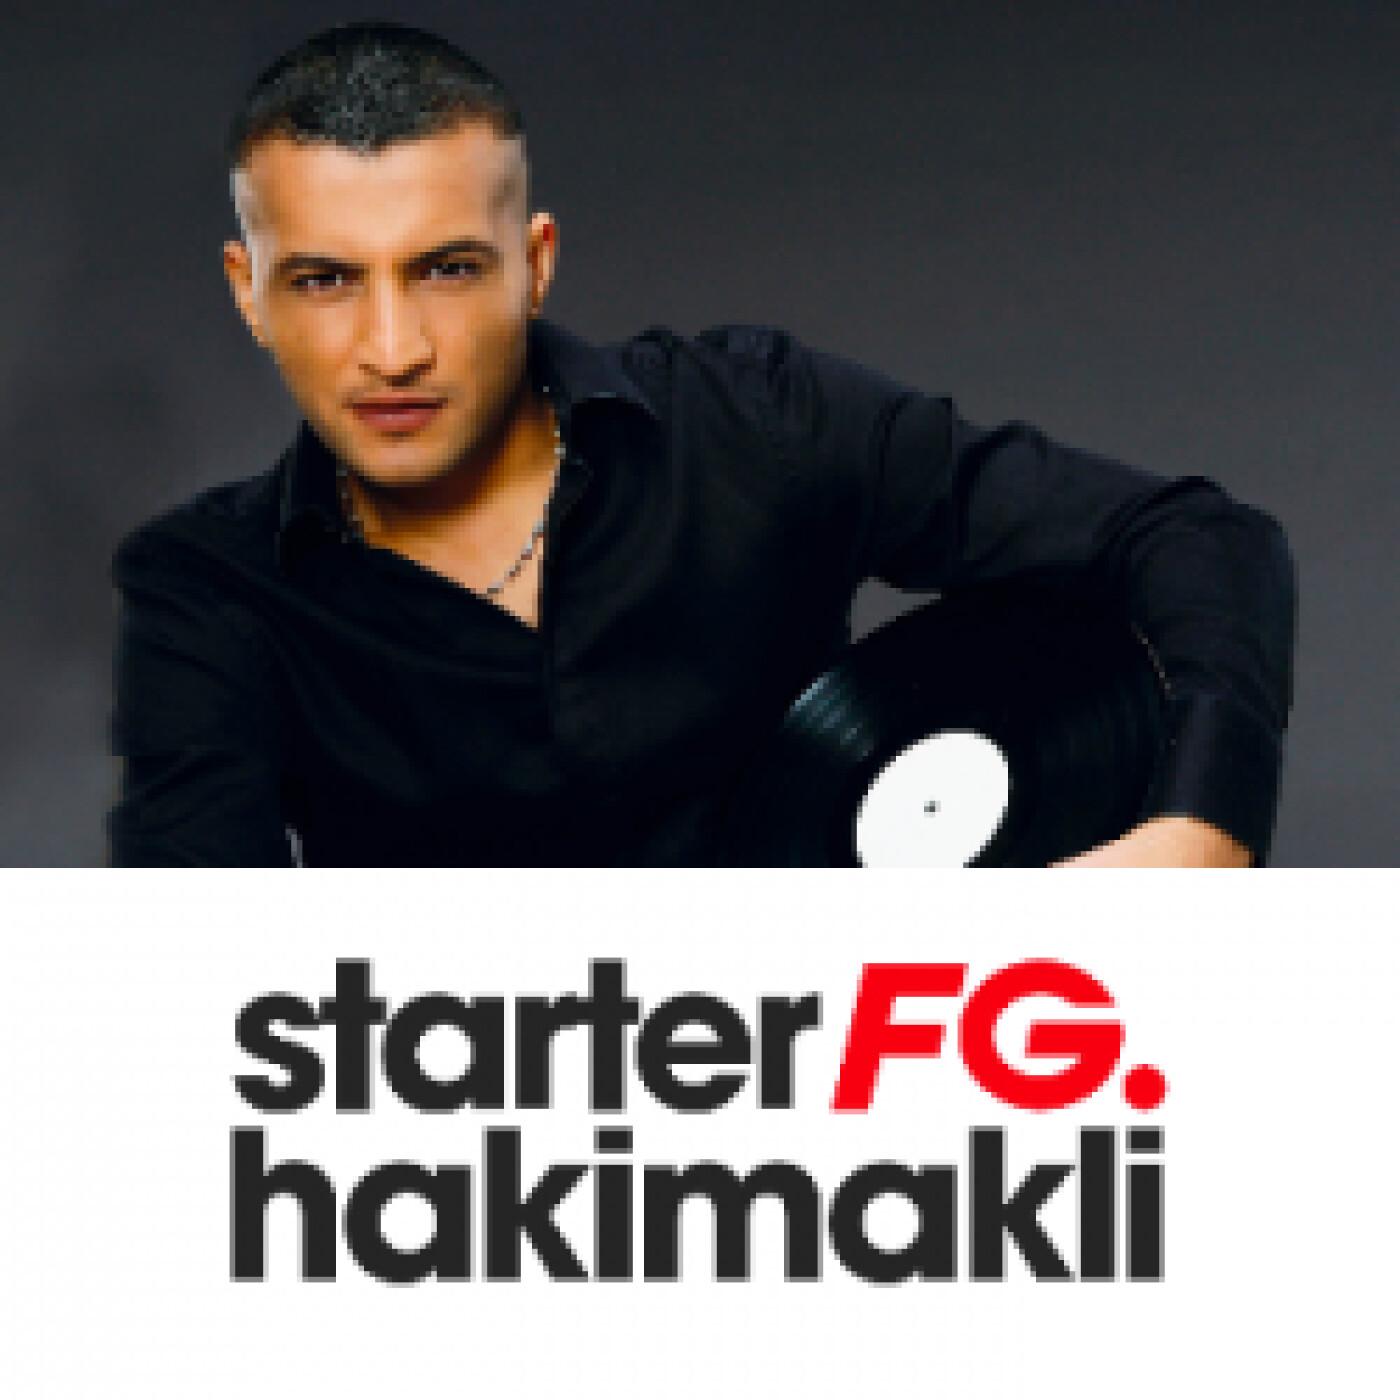 STARTER FG BY HAKIMAKLI MARDI 9 MARS 2021